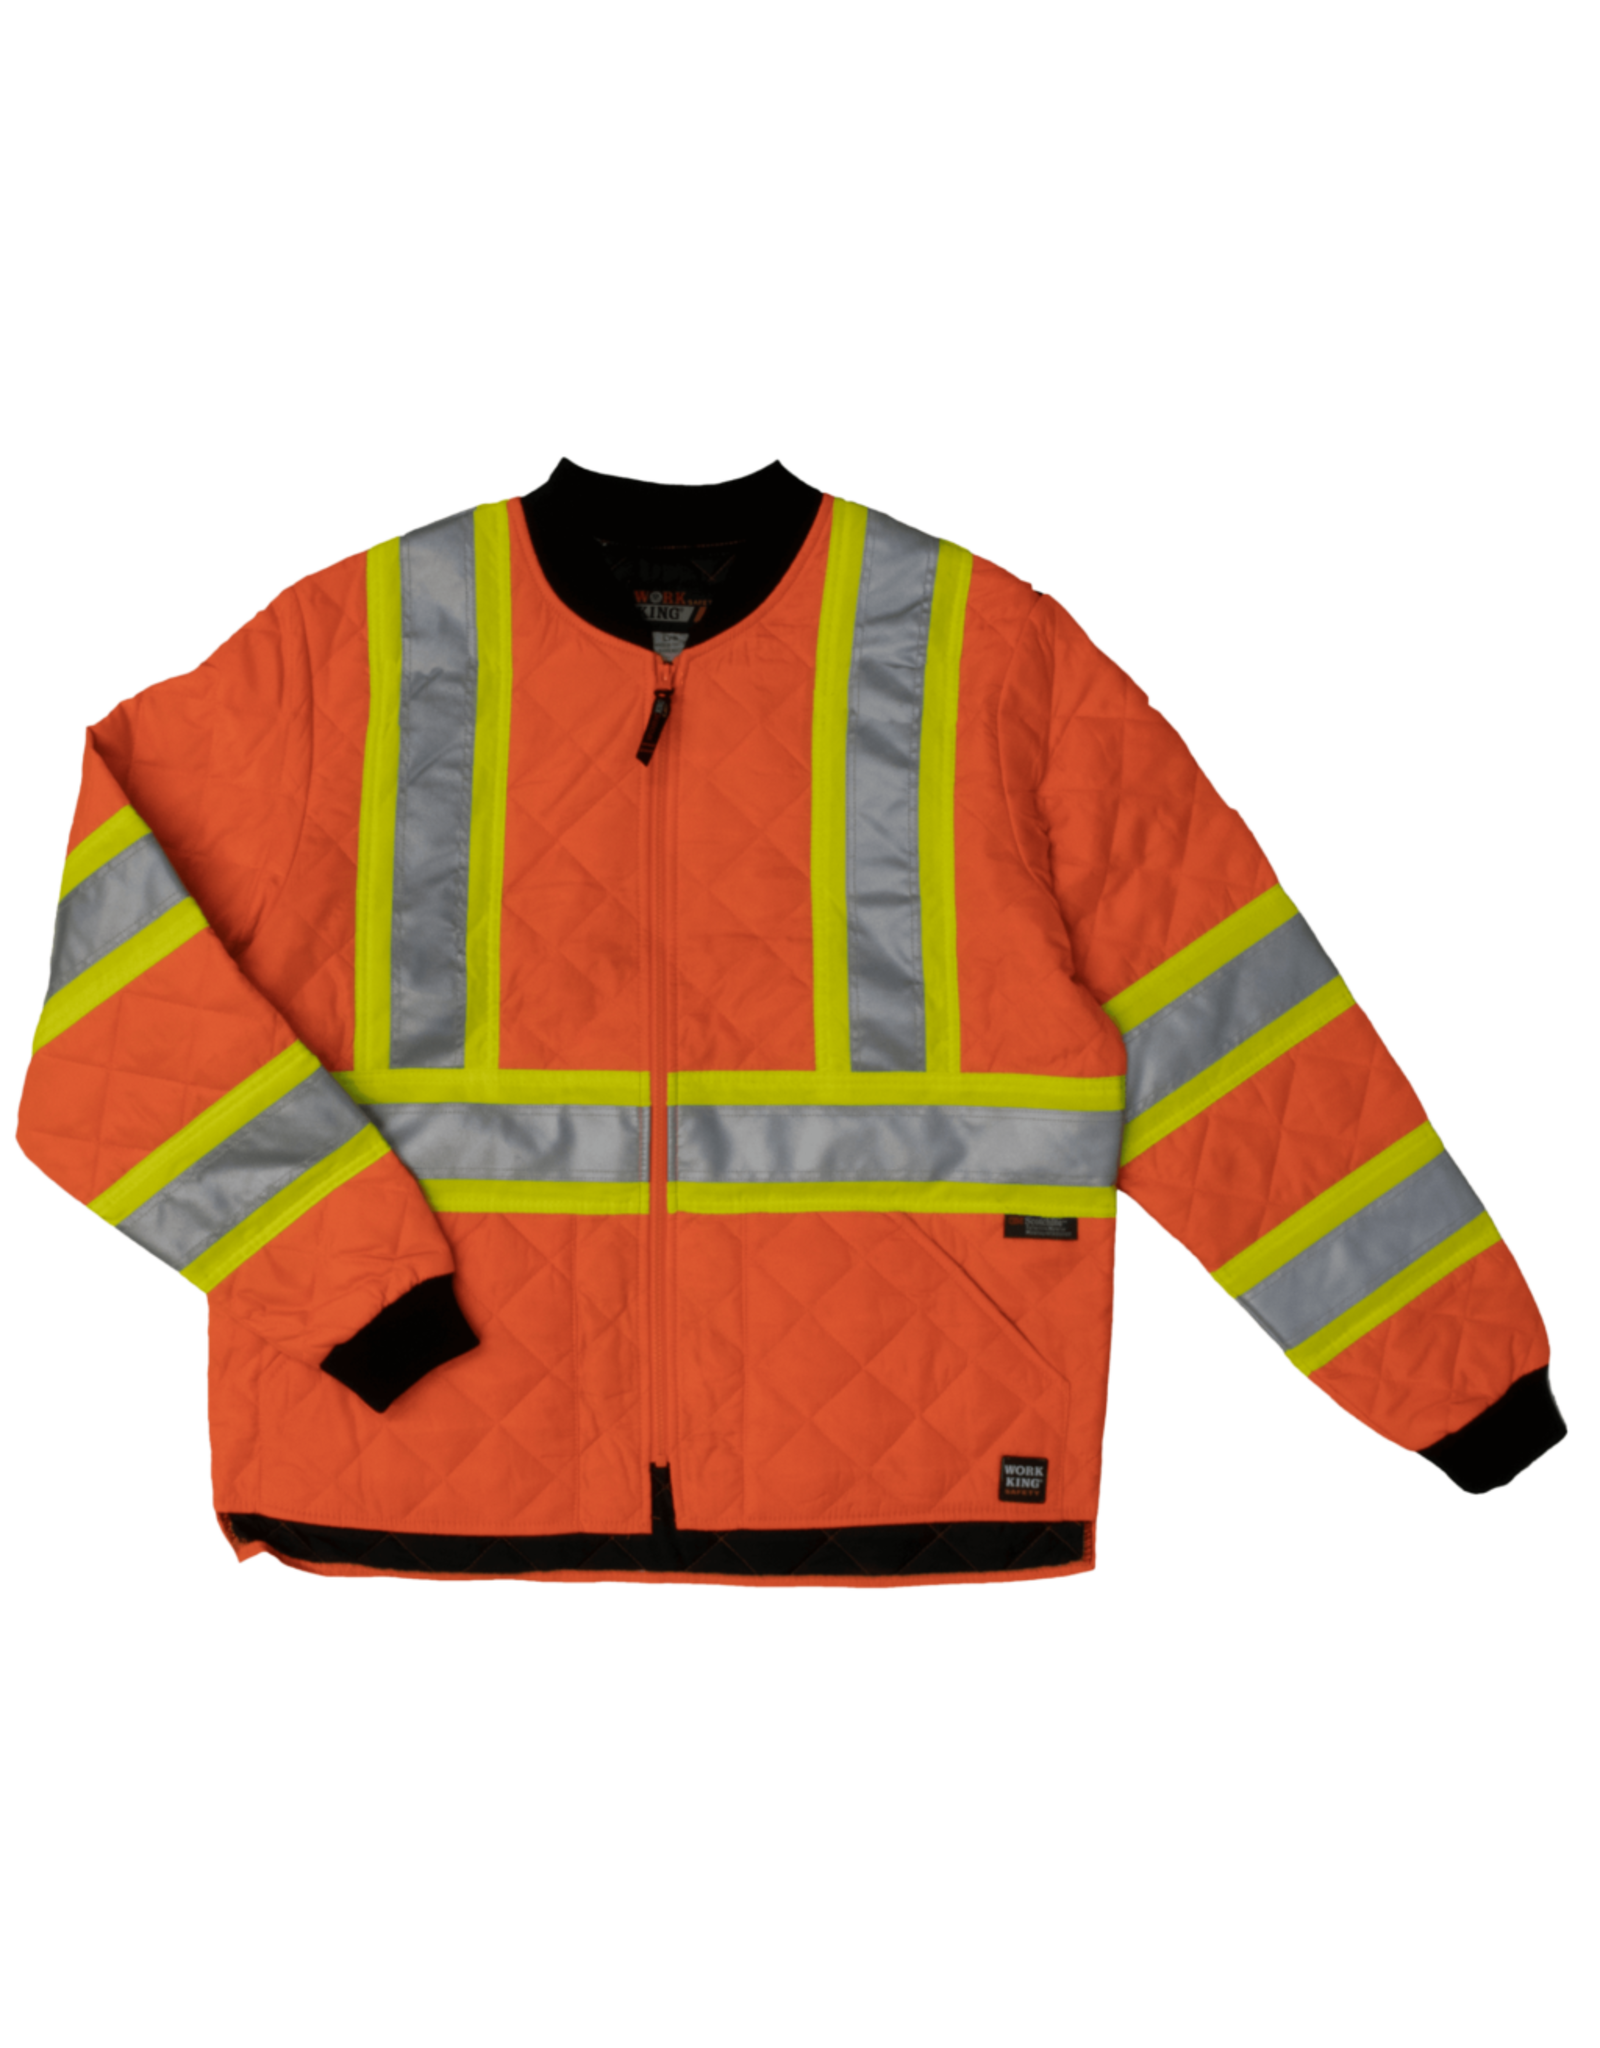 Work King Orange Quilted Safety Jacket